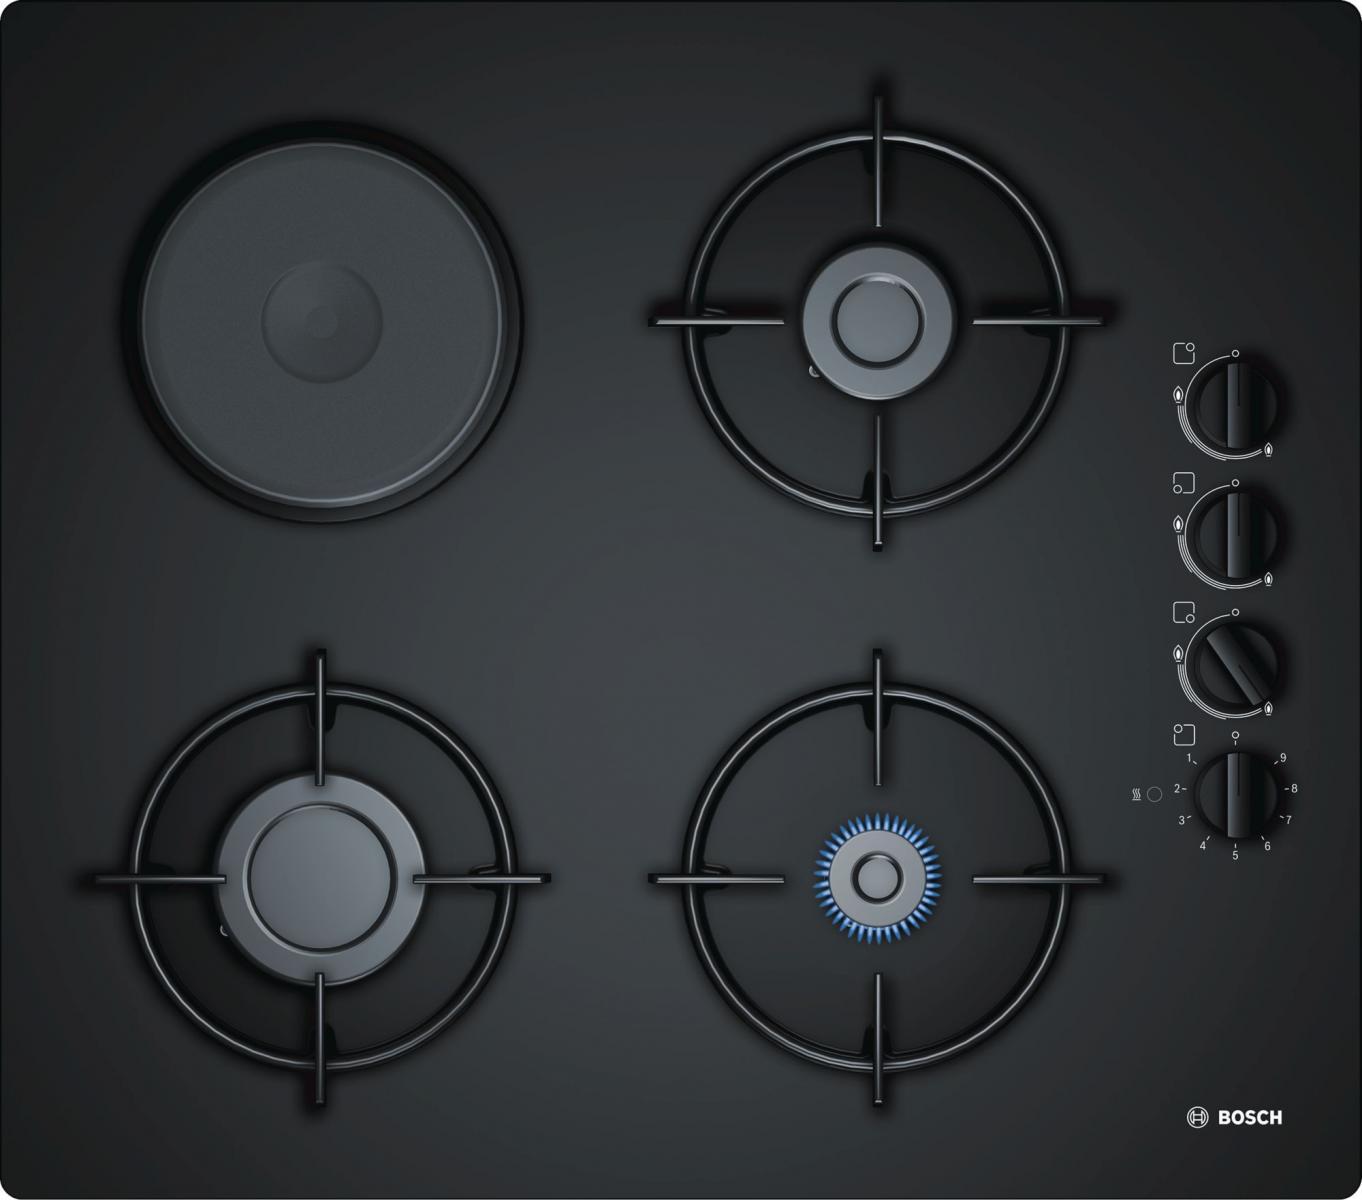 POY6B6B10 kombinirana ploča za kuhanje na kaljenom staklu Bosch